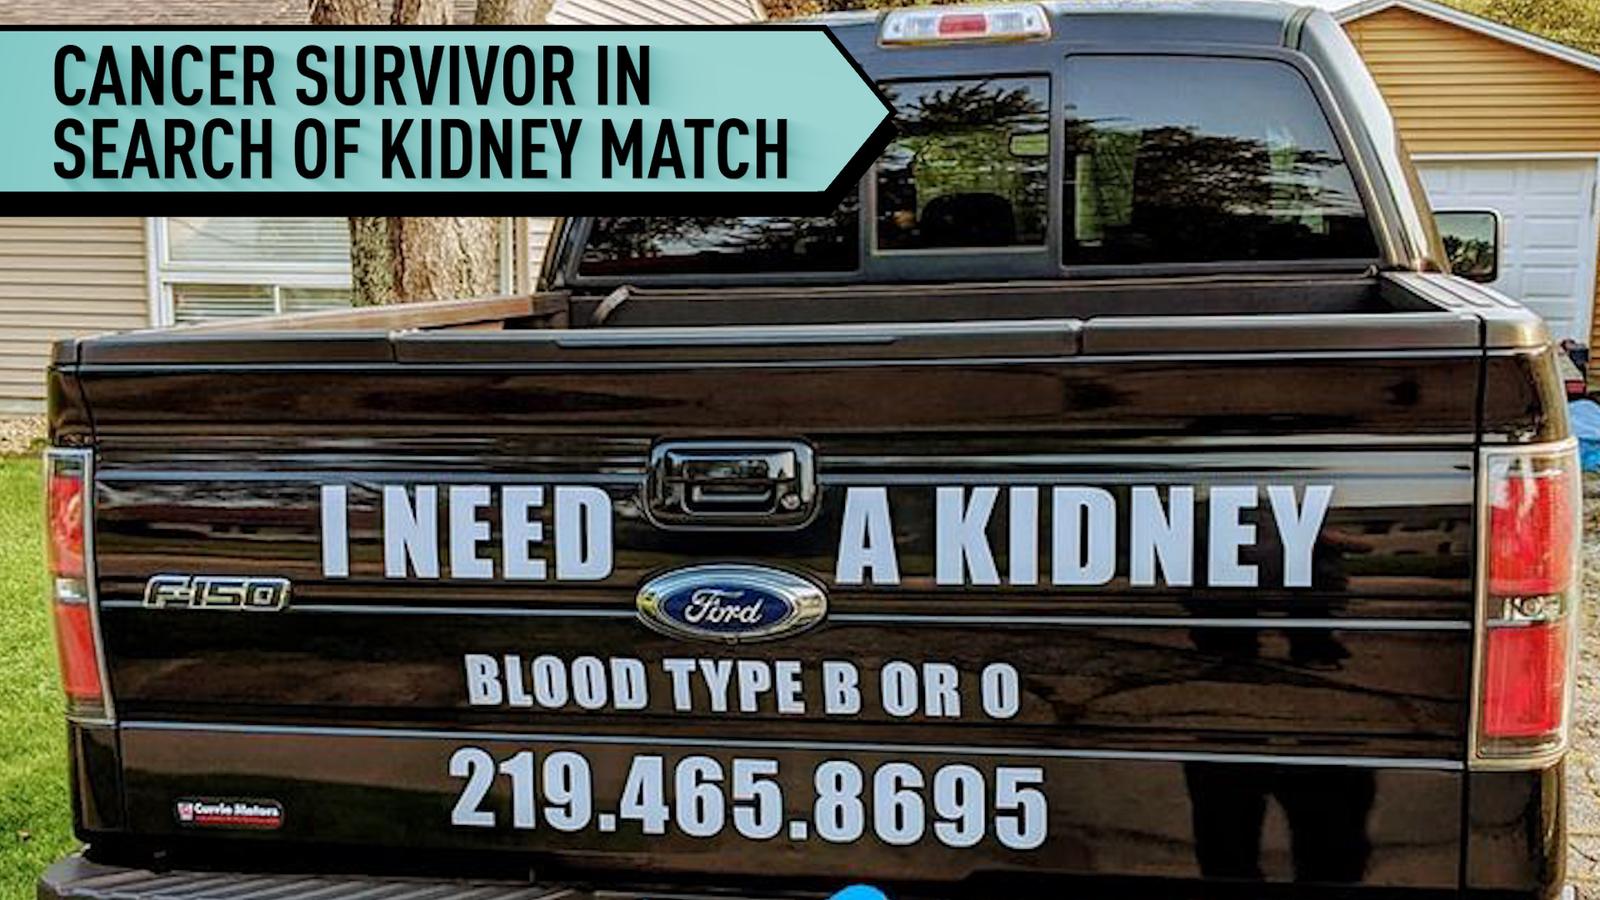 Cancer survivor in search of kidney match